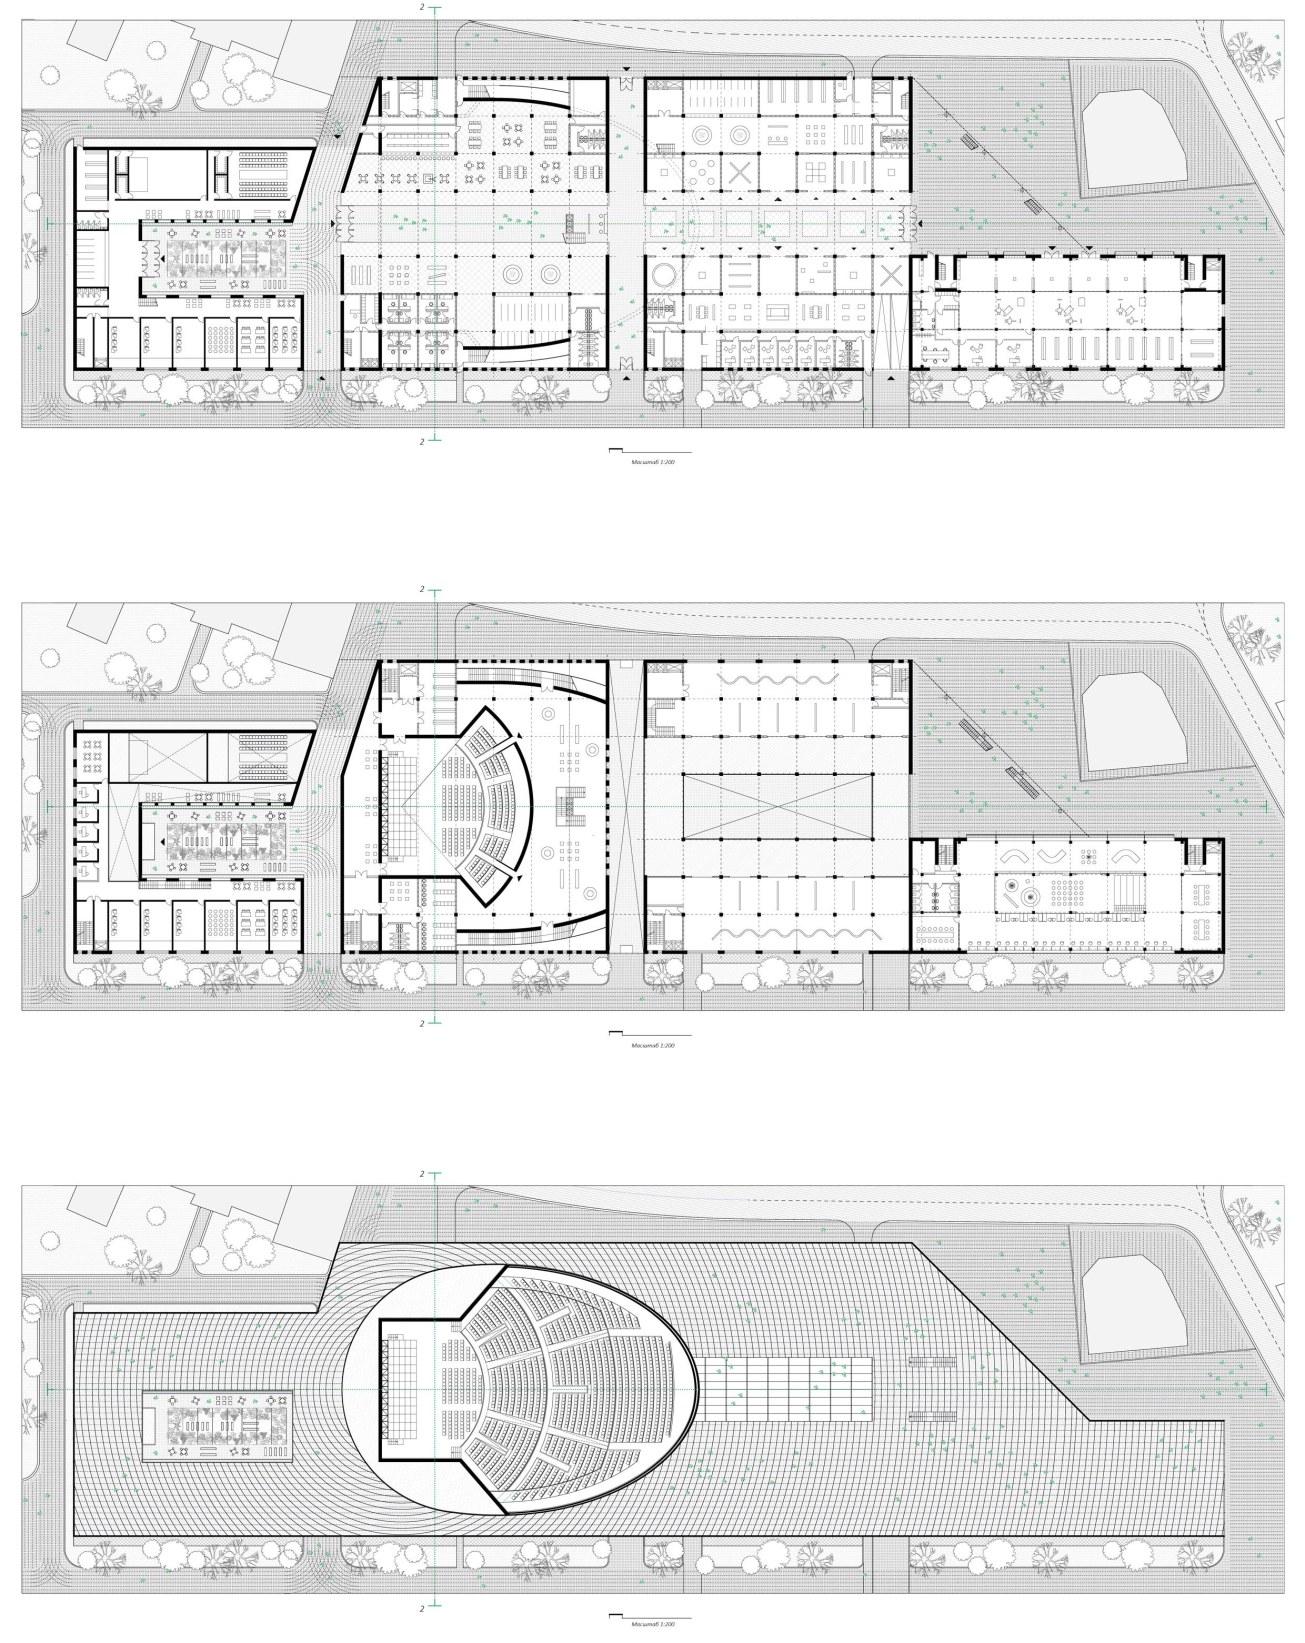 Diploma_MoscowInstituteofArchitecture_JuliaKhomutskaya_Student4